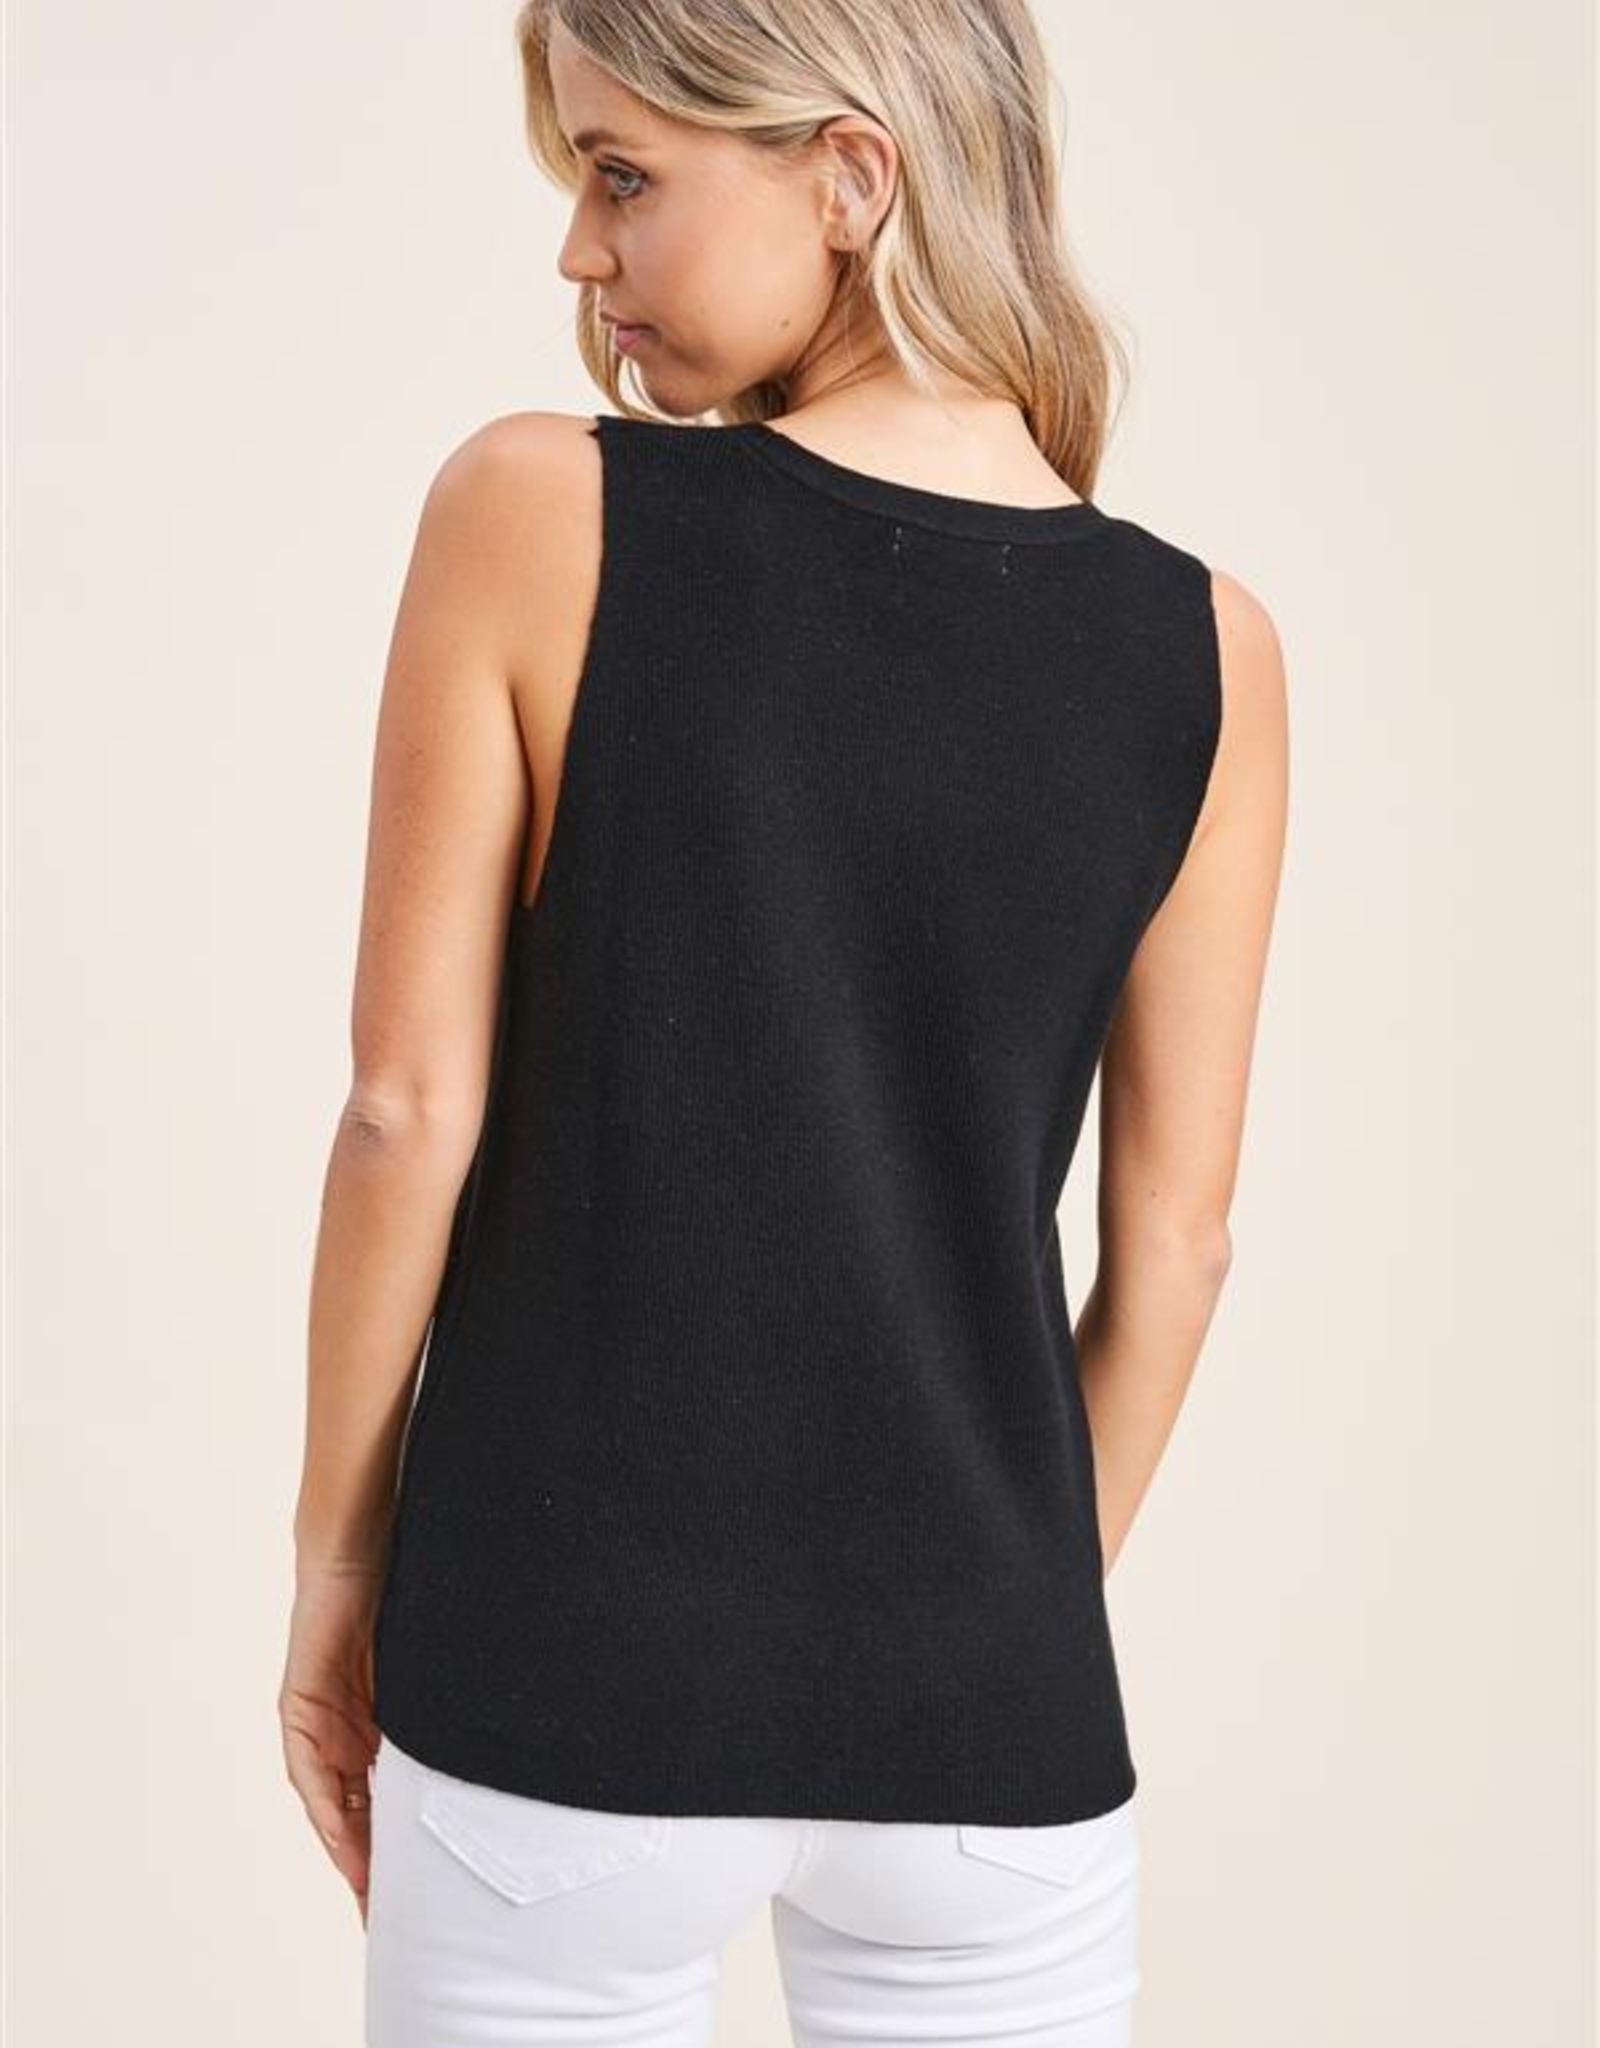 Sleeveless Sweater Top